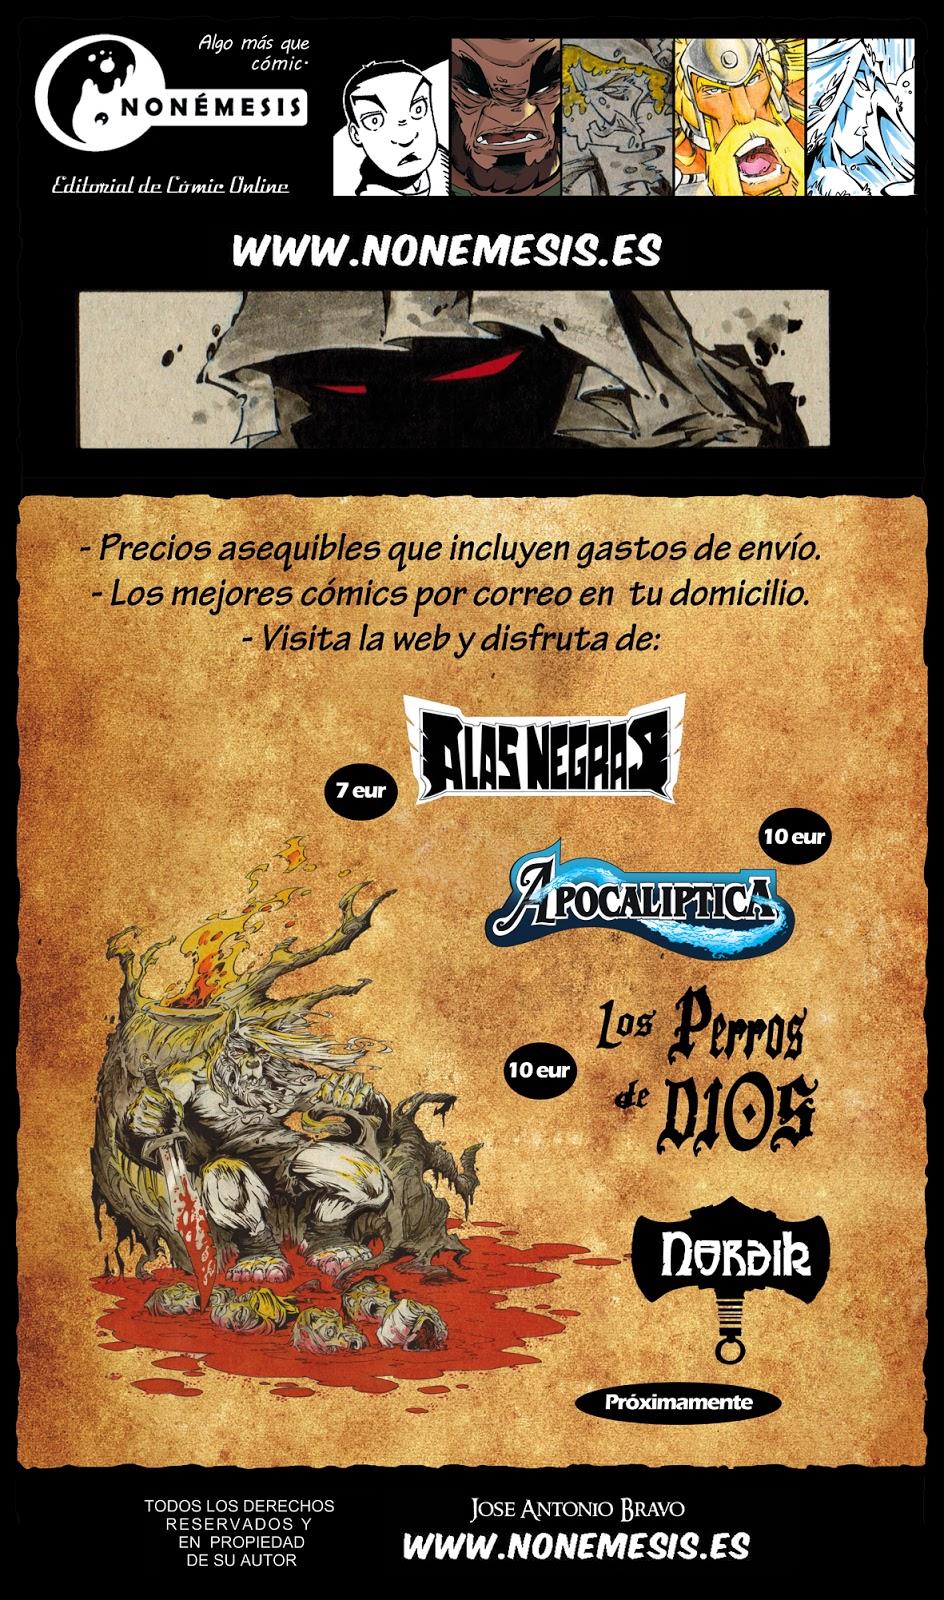 http://nonemesis.blogspot.com.es/